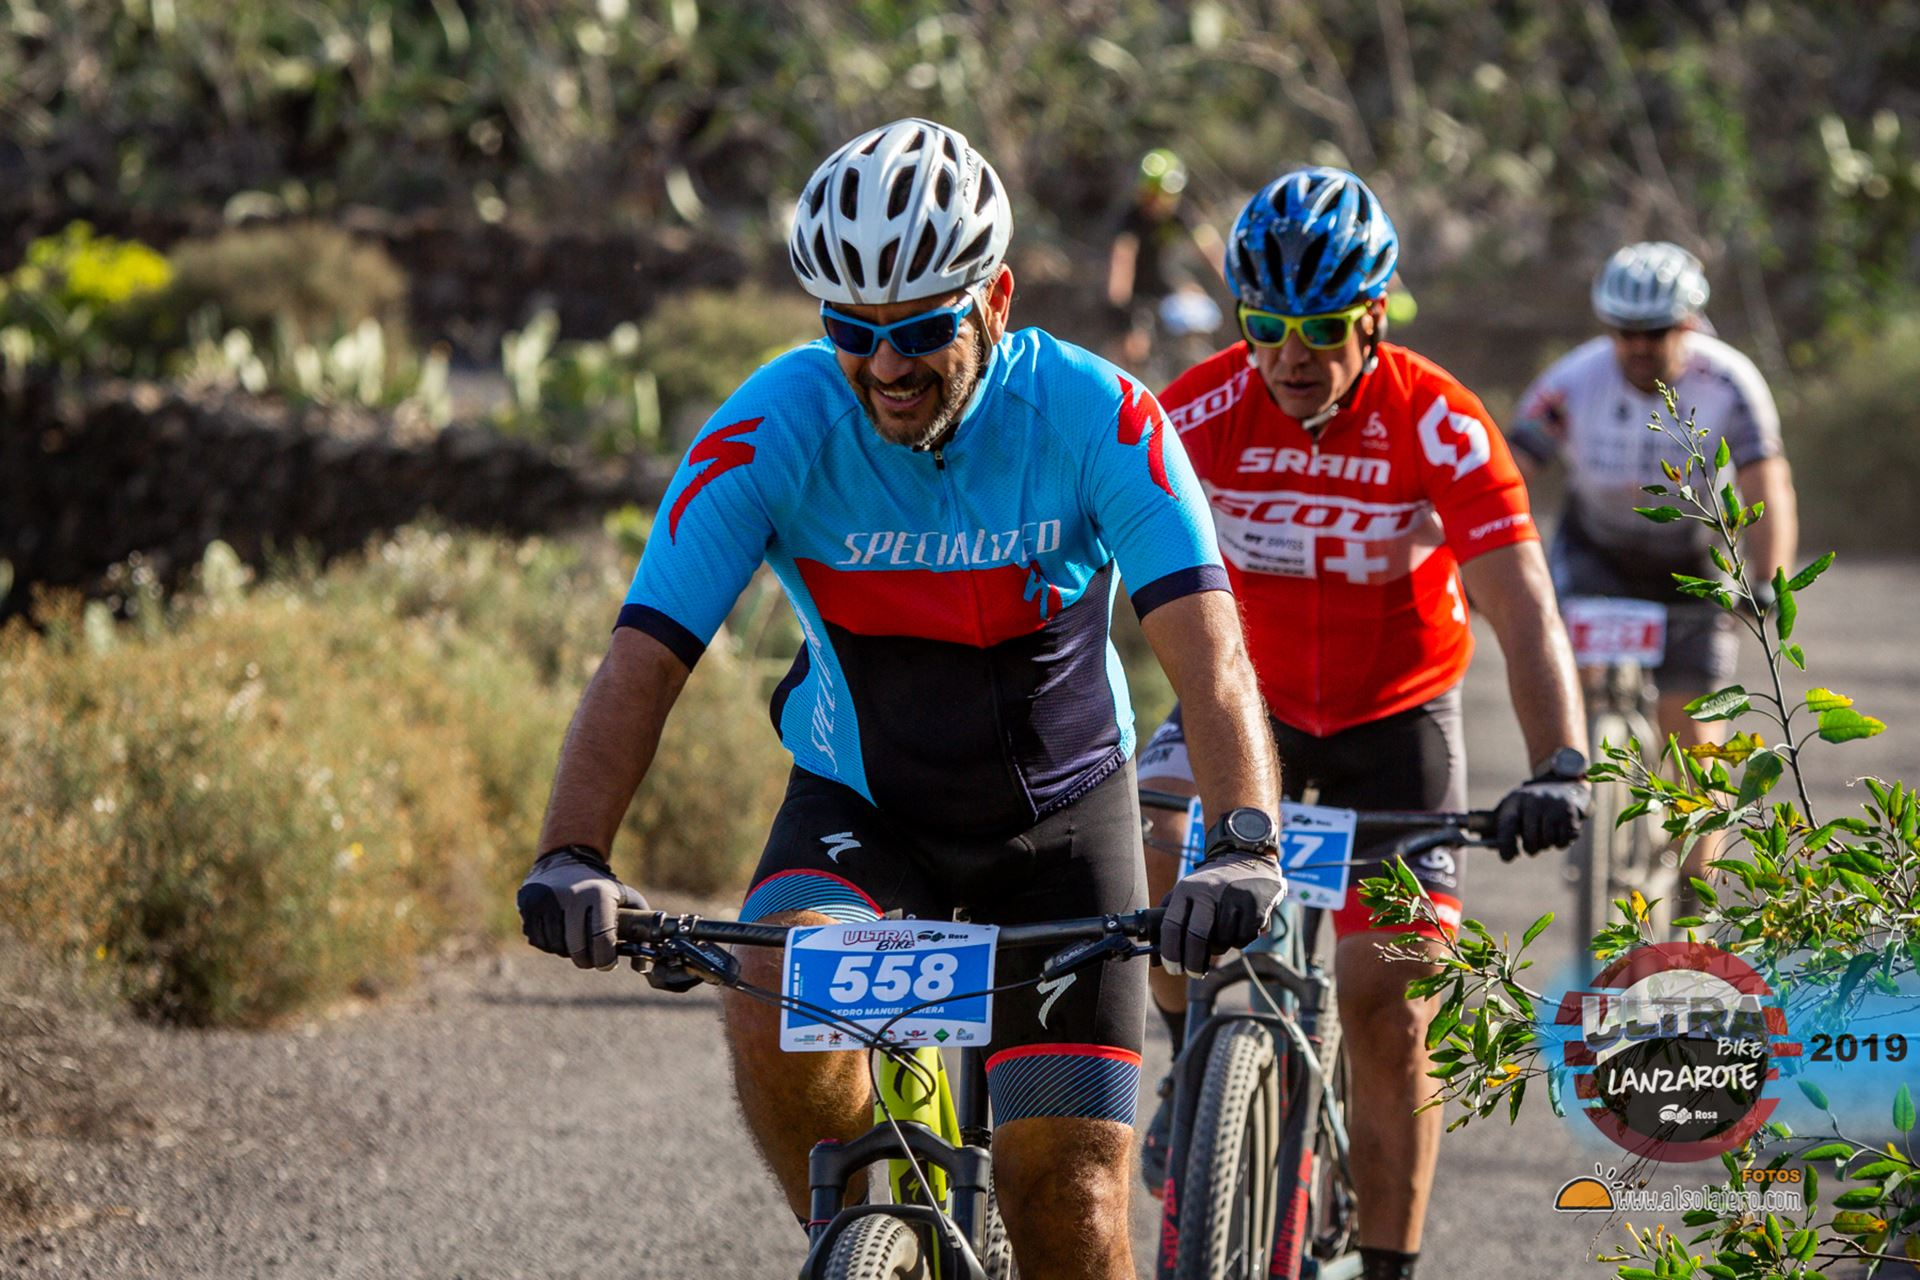 Sector Guatiza 2ª Etapa Ultrabike 2019 Fotos Alsolajero.com-154